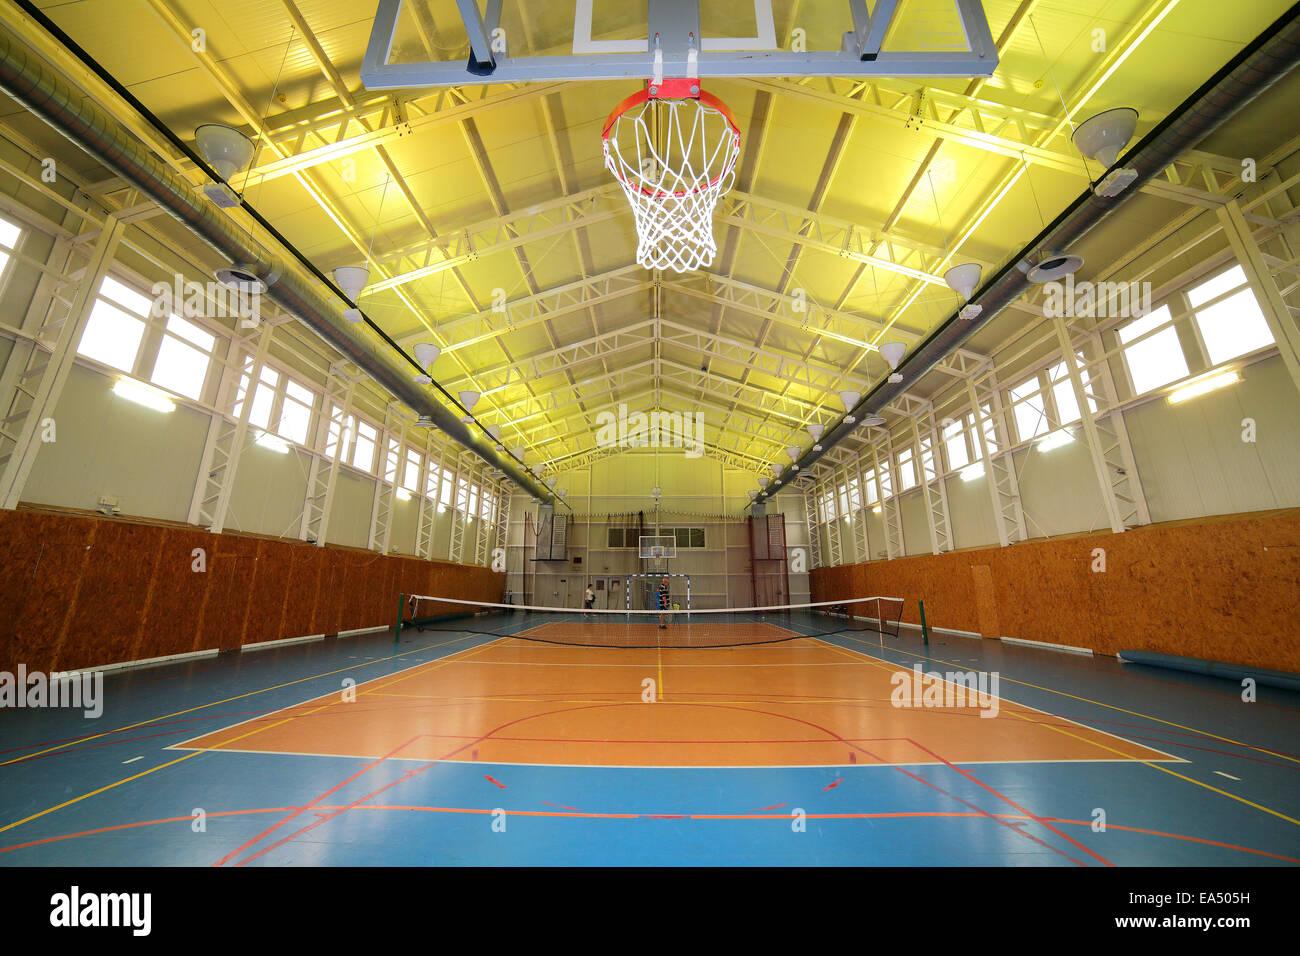 Sports Basket-ball Photo Stock